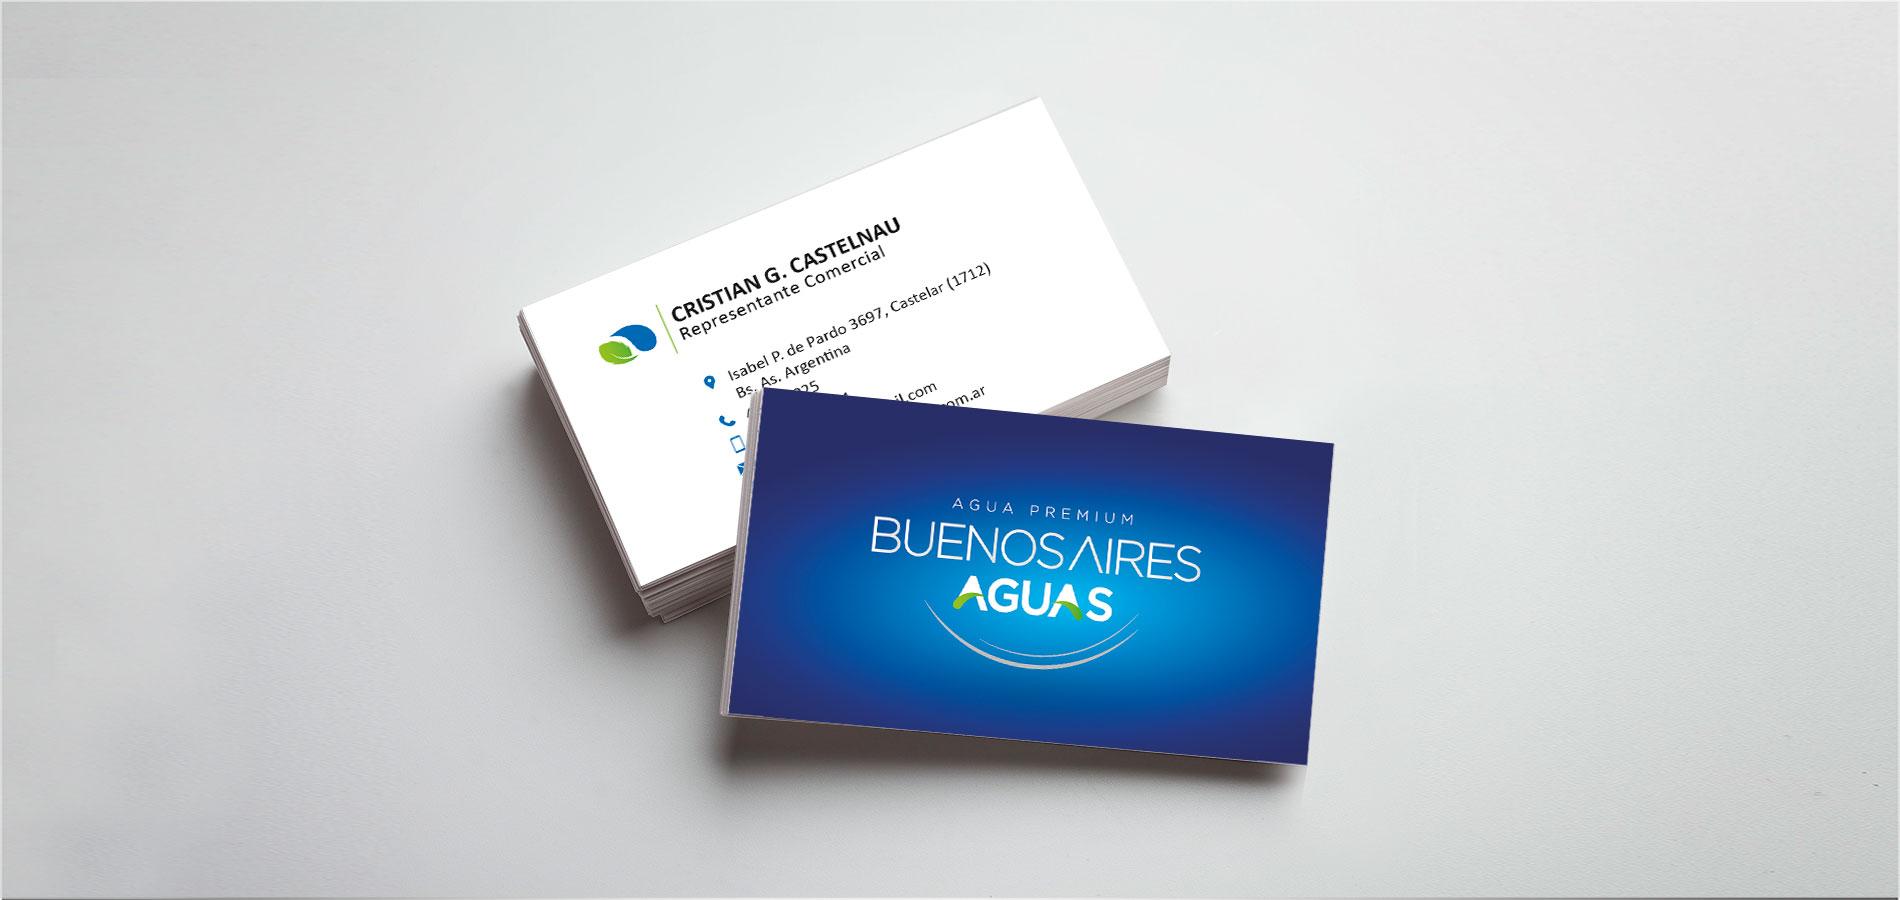 Buenos Aires Aguas